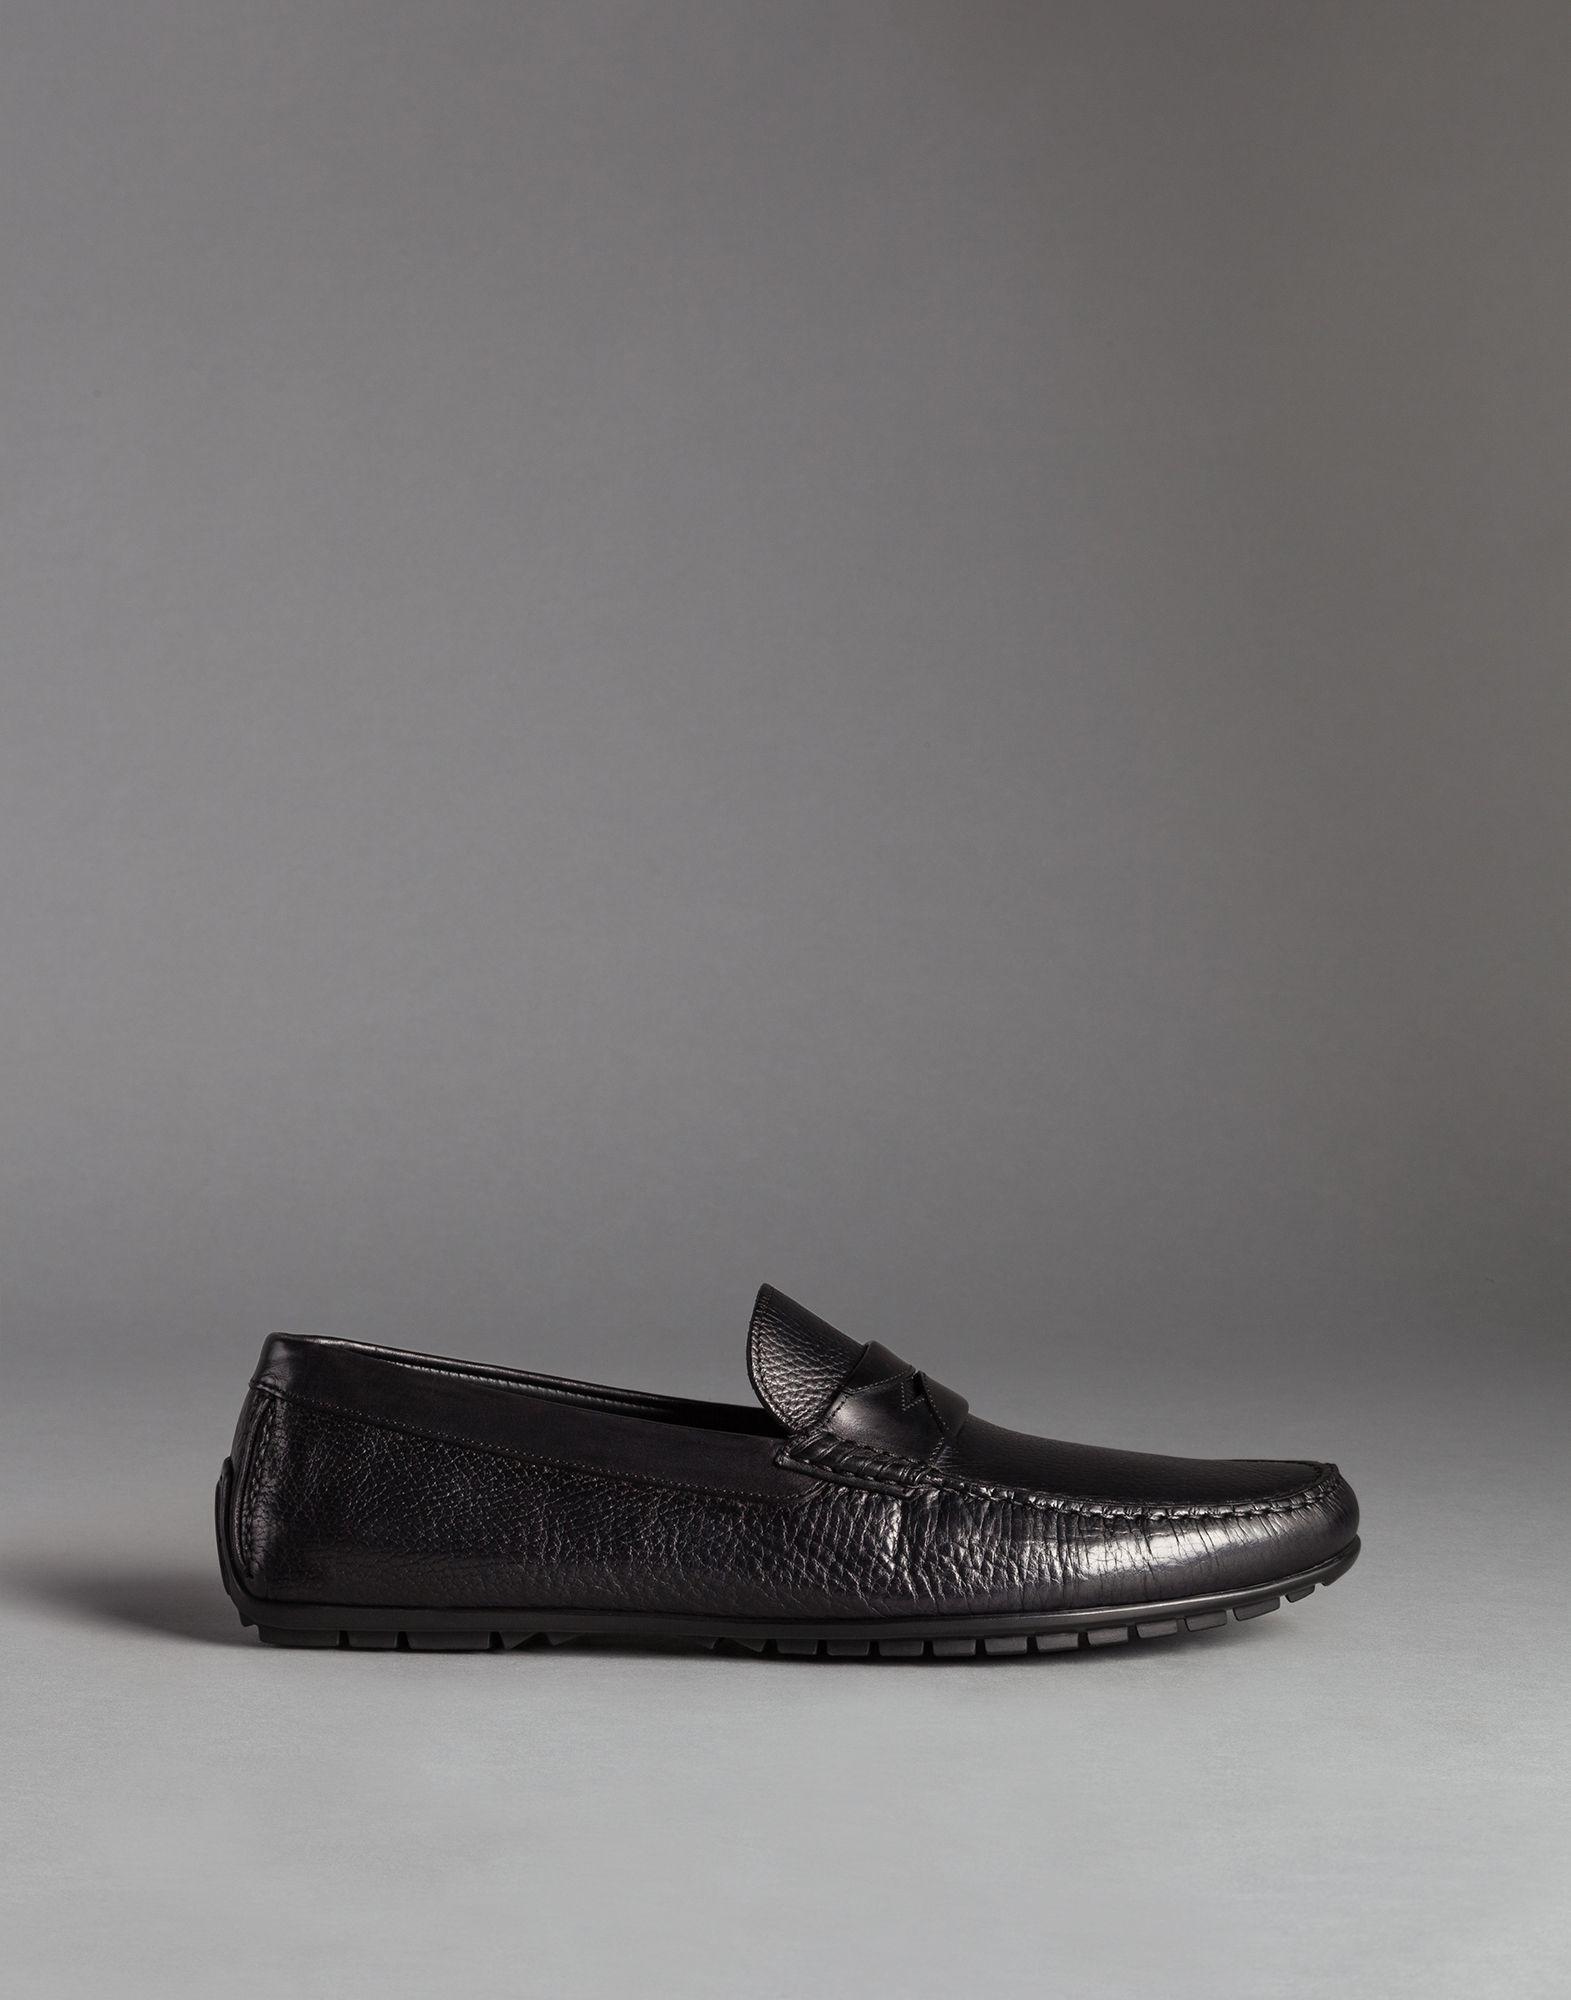 4af8a4e1cdf Lyst - Dolce   Gabbana Matisse Calfskin Ragusa Driving Shoes in ...